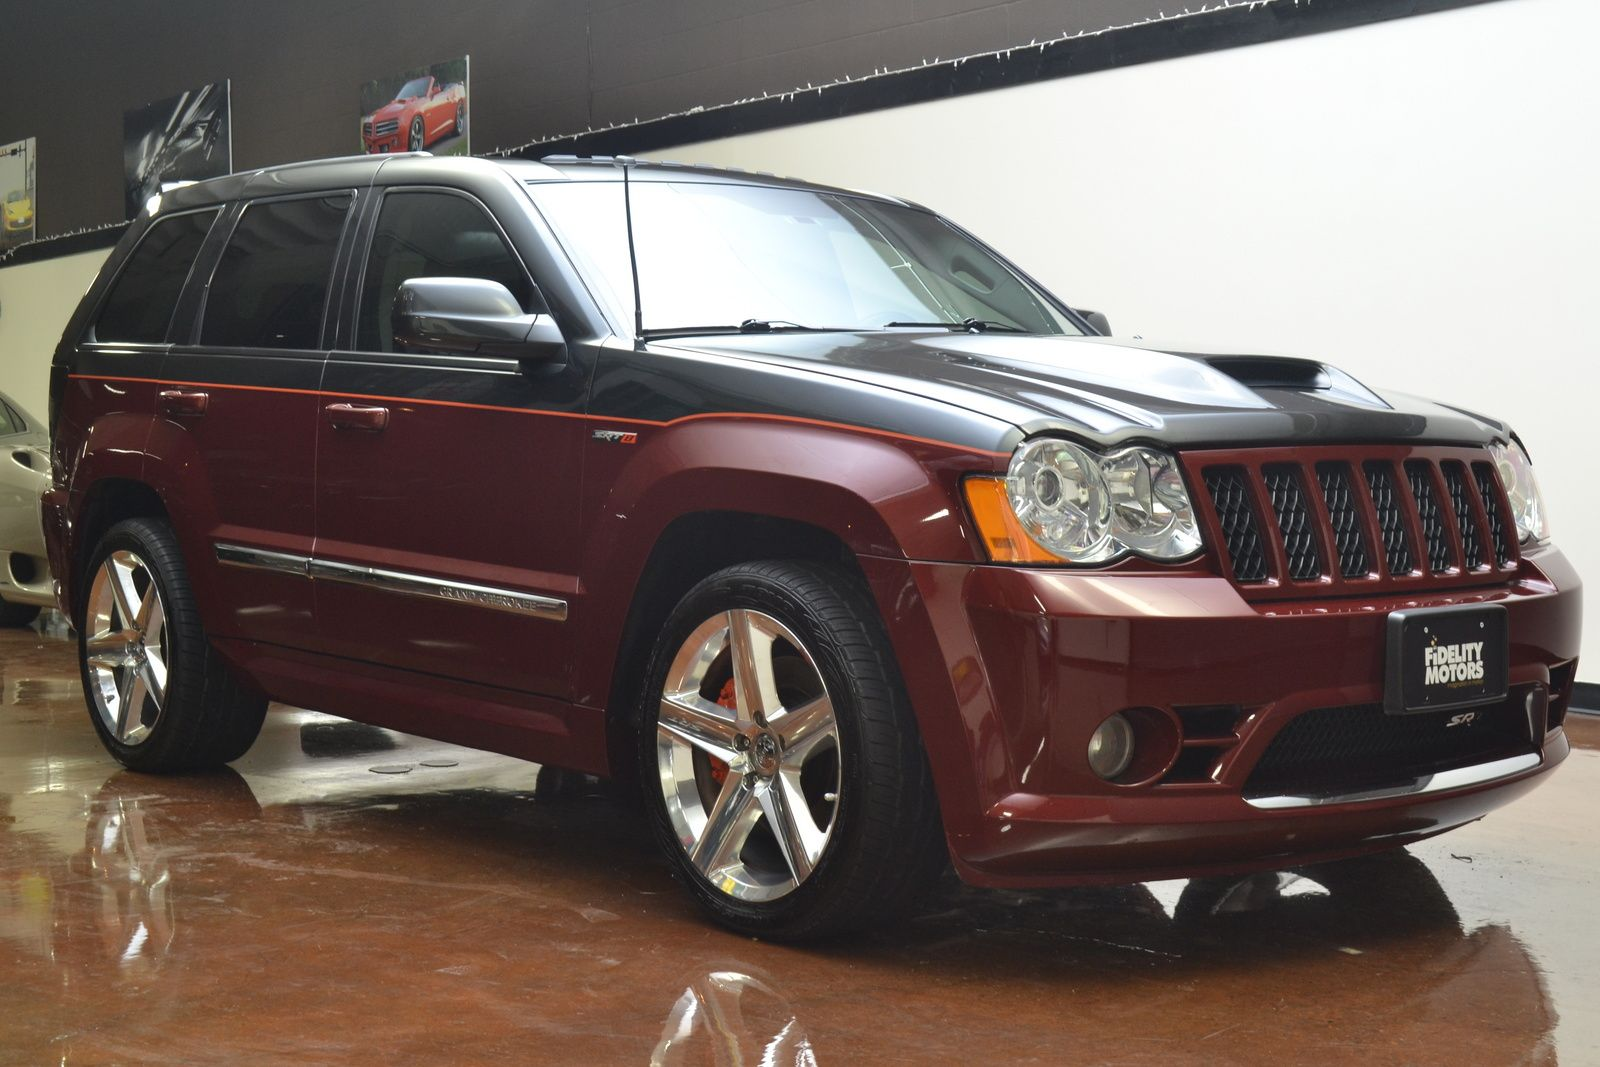 fidelitymotors 39 2008 jeep grand cherokee srt8 www. Black Bedroom Furniture Sets. Home Design Ideas